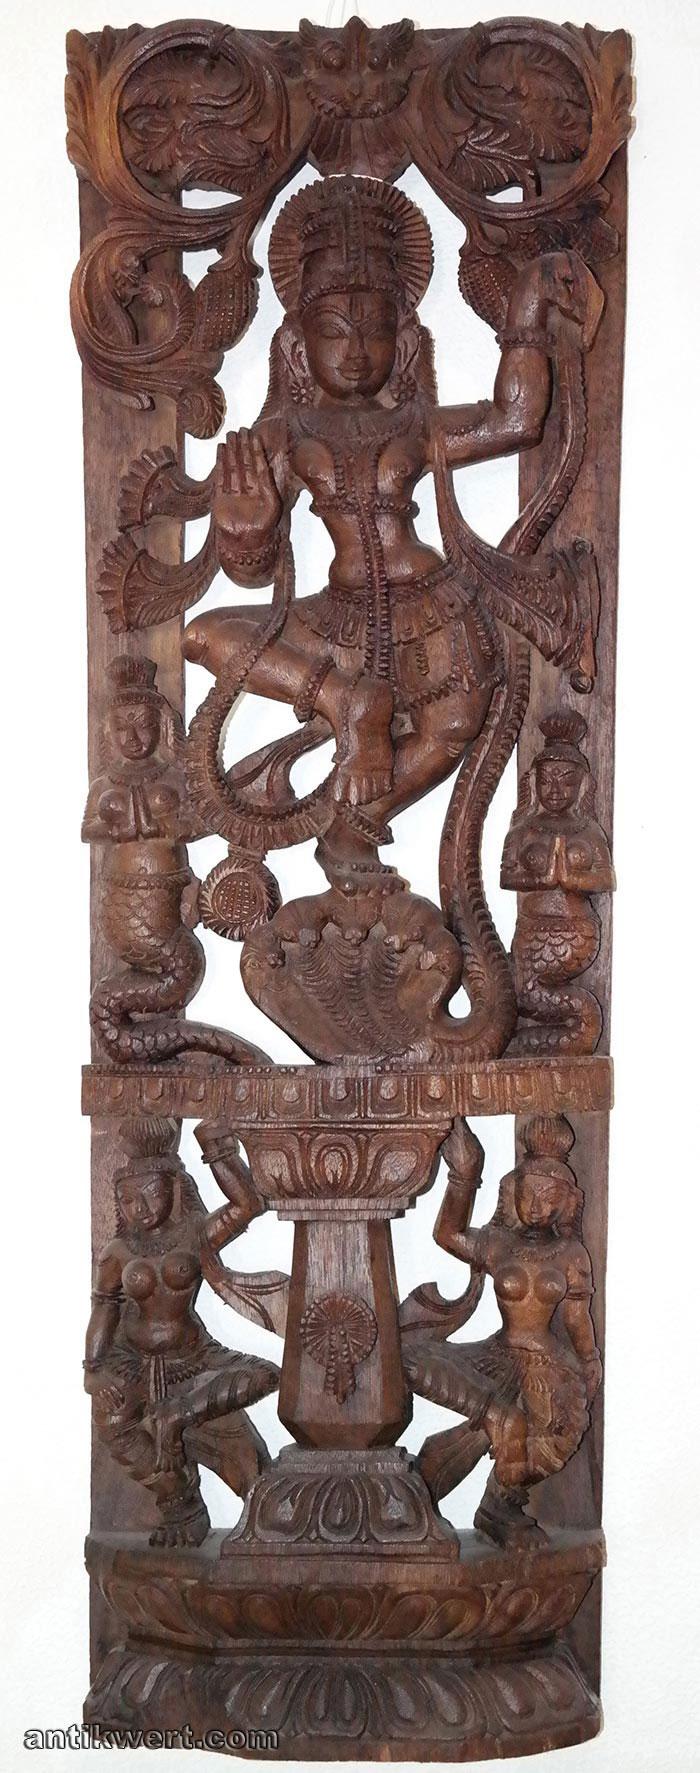 Shiva-Holz-273 geschnitzt